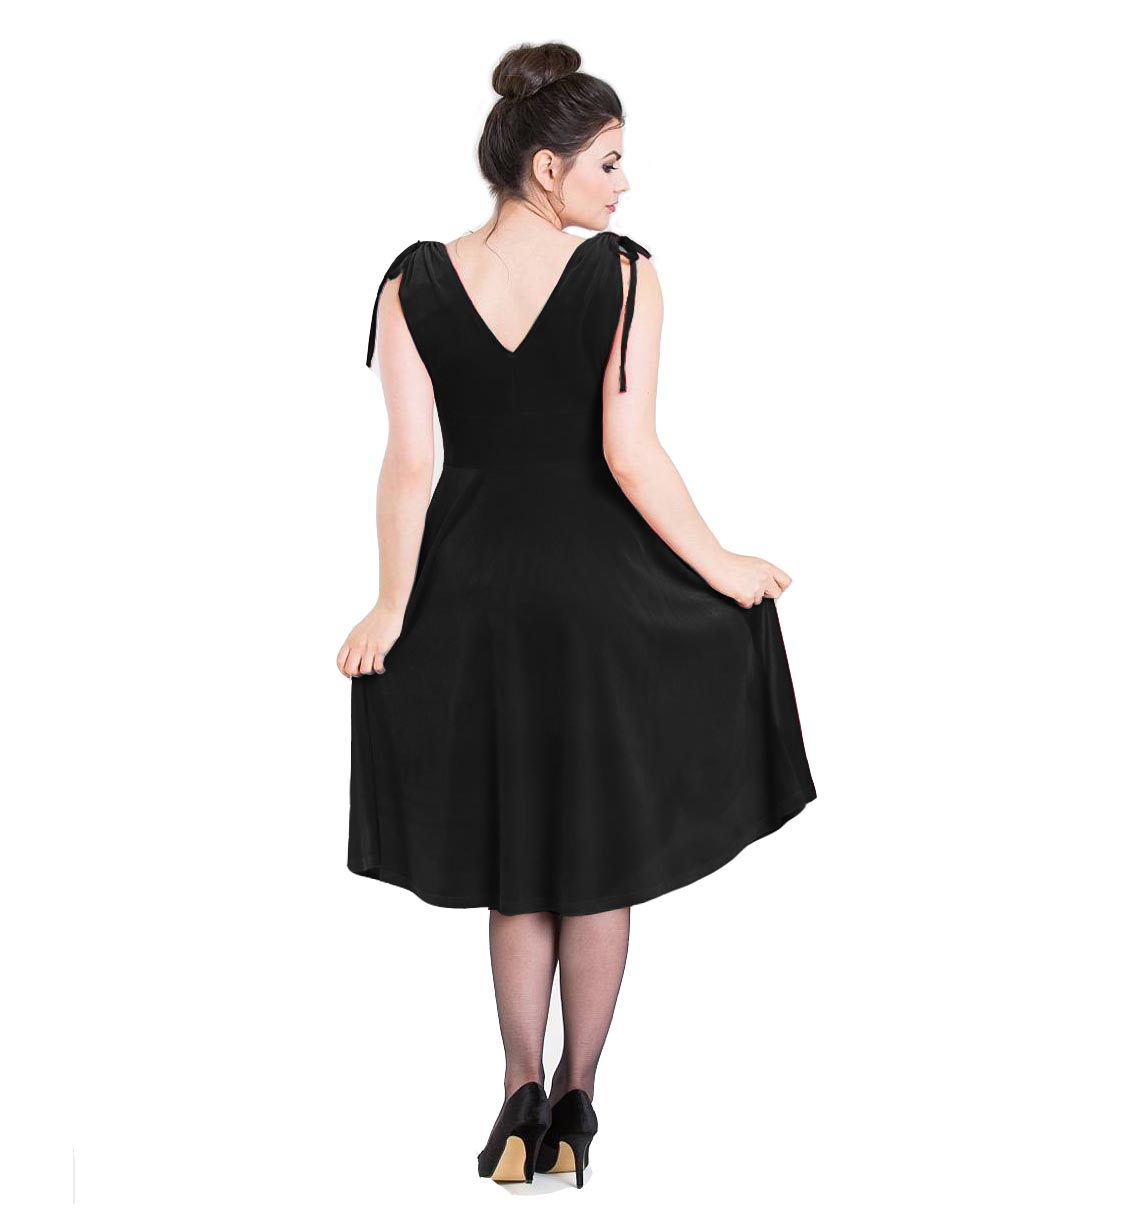 Hell-Bunny-40s-50s-Elegant-Pin-Up-Dress-MELINA-Crushed-Velvet-Black-All-Sizes thumbnail 9